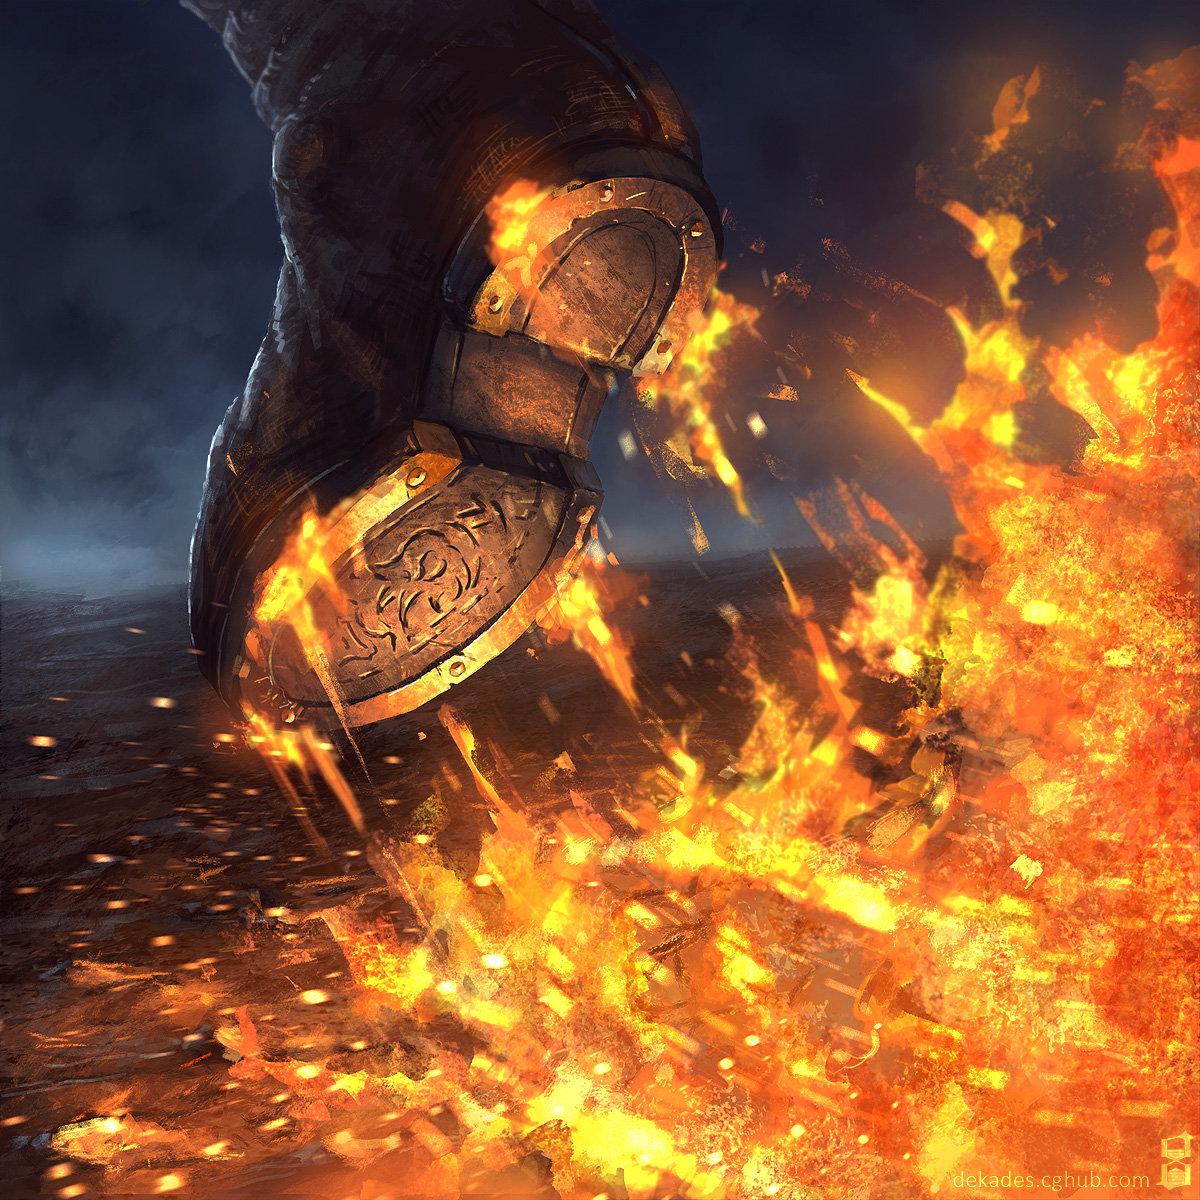 Dmitry desyatov walk of flames jpg